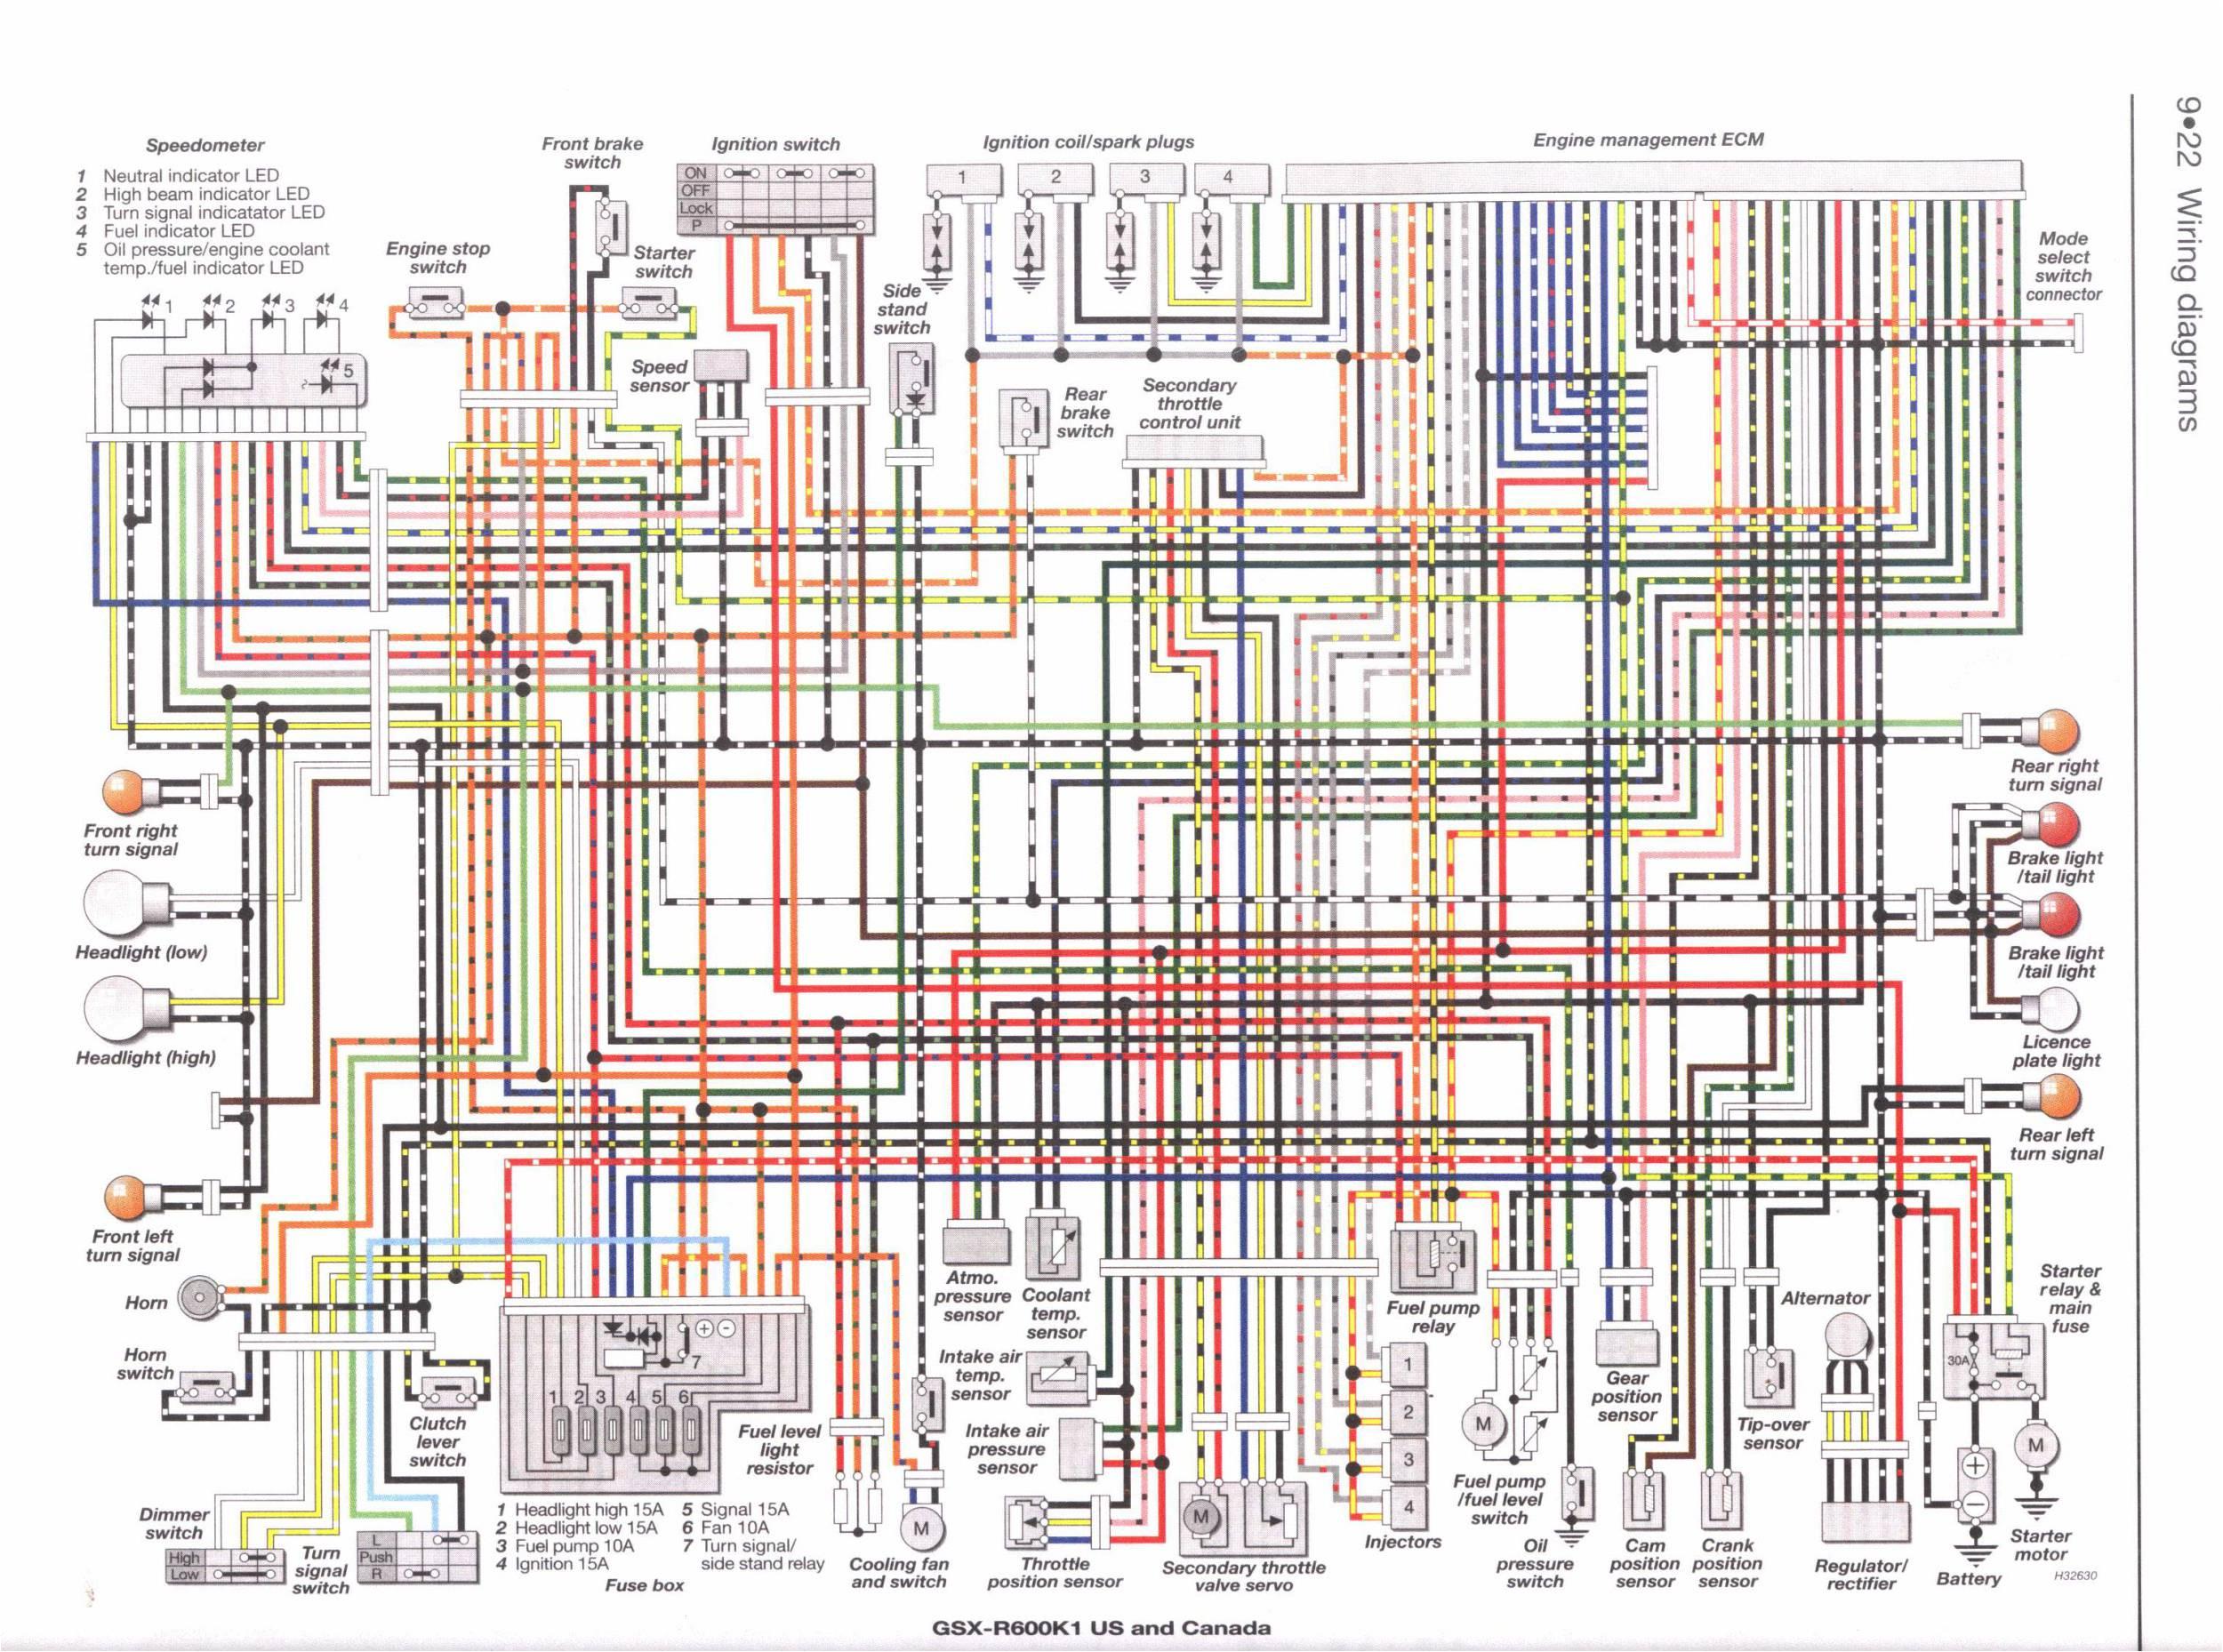 gsx r 600 k1 k2 wiring diagram jpg